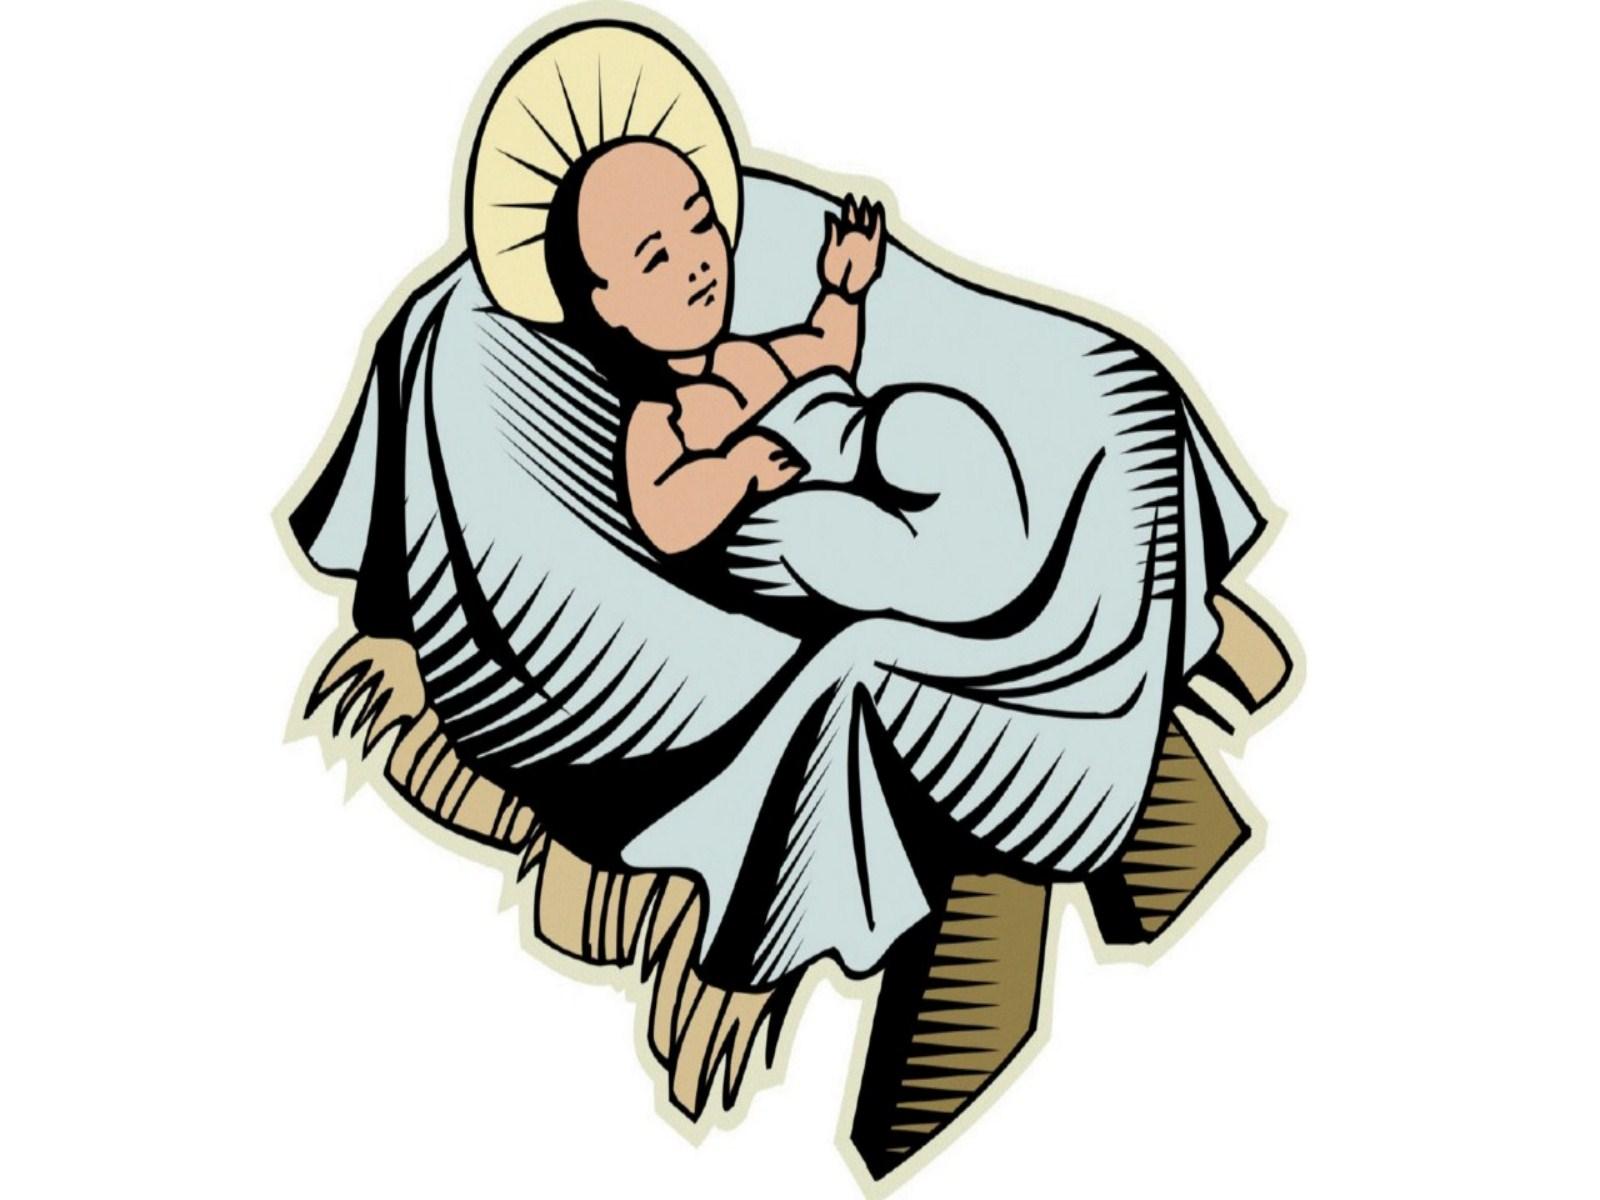 Baby Jesus Christmas Wallpaper - 1600x1200 - 197518